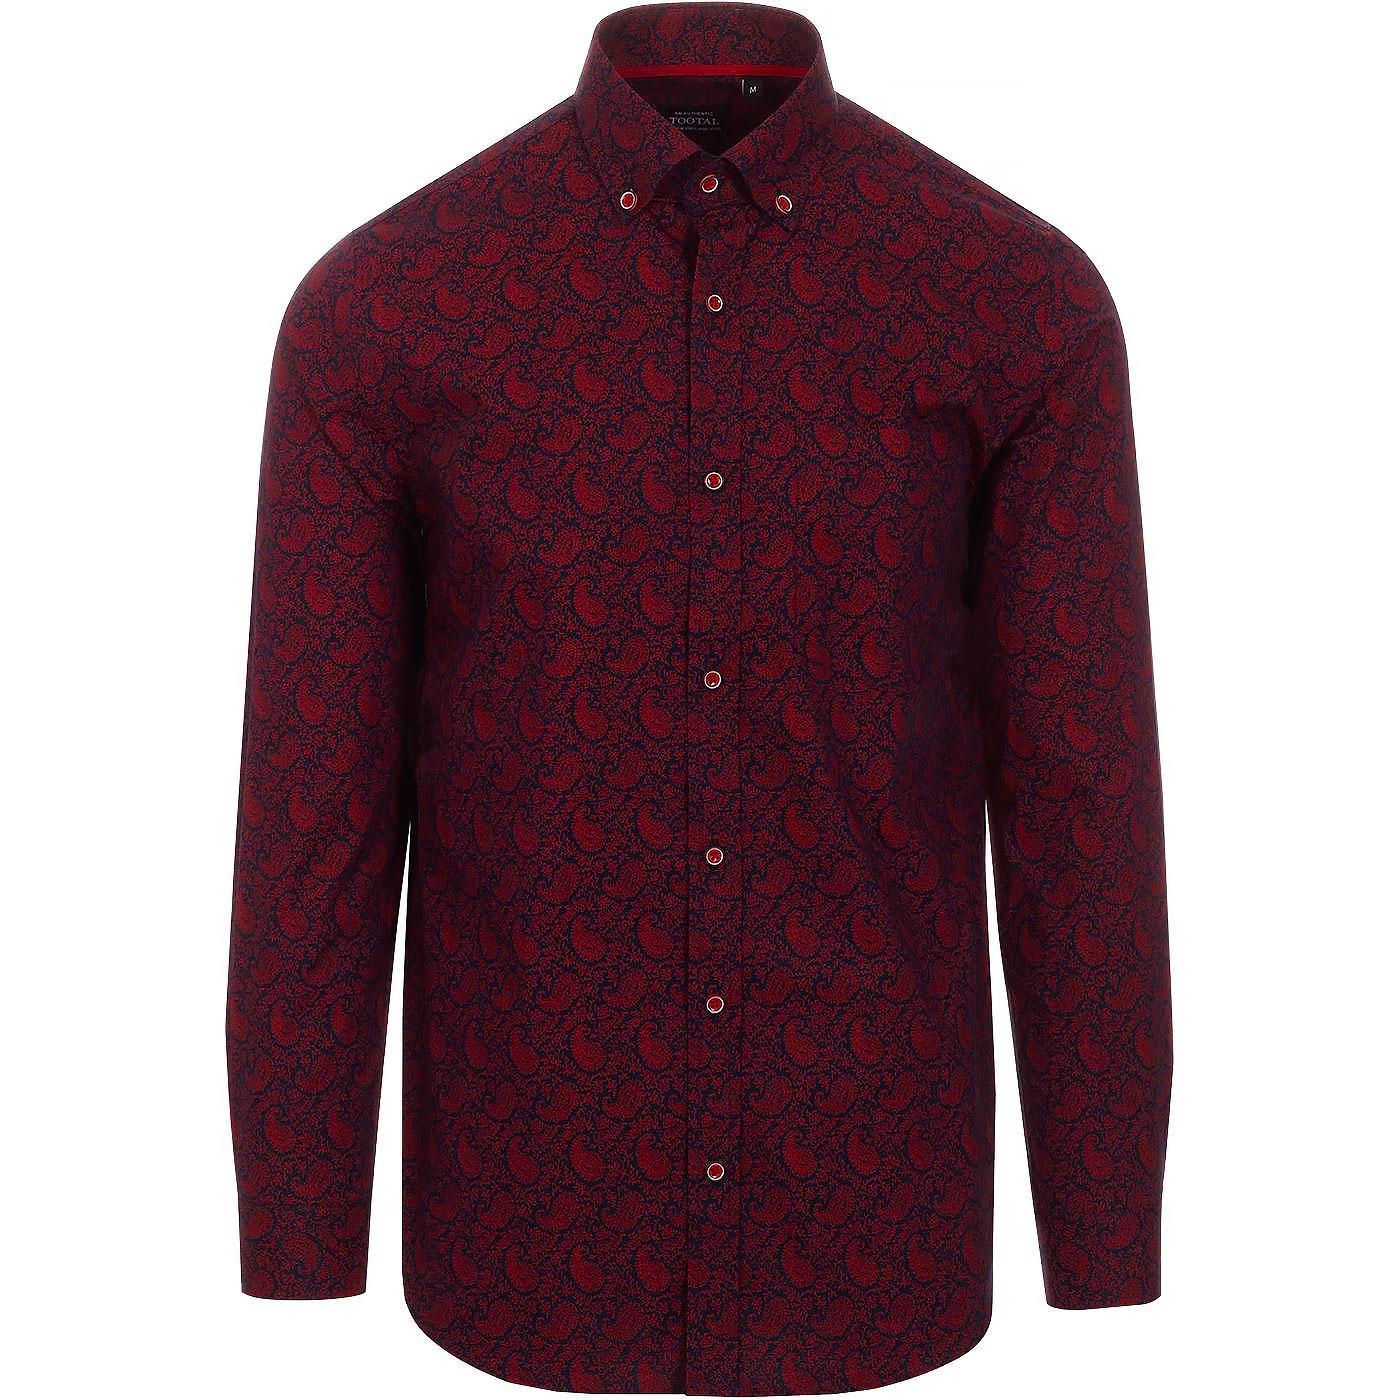 TOOTAL Retro Mod Decorative Paisley Shirt (Navy)